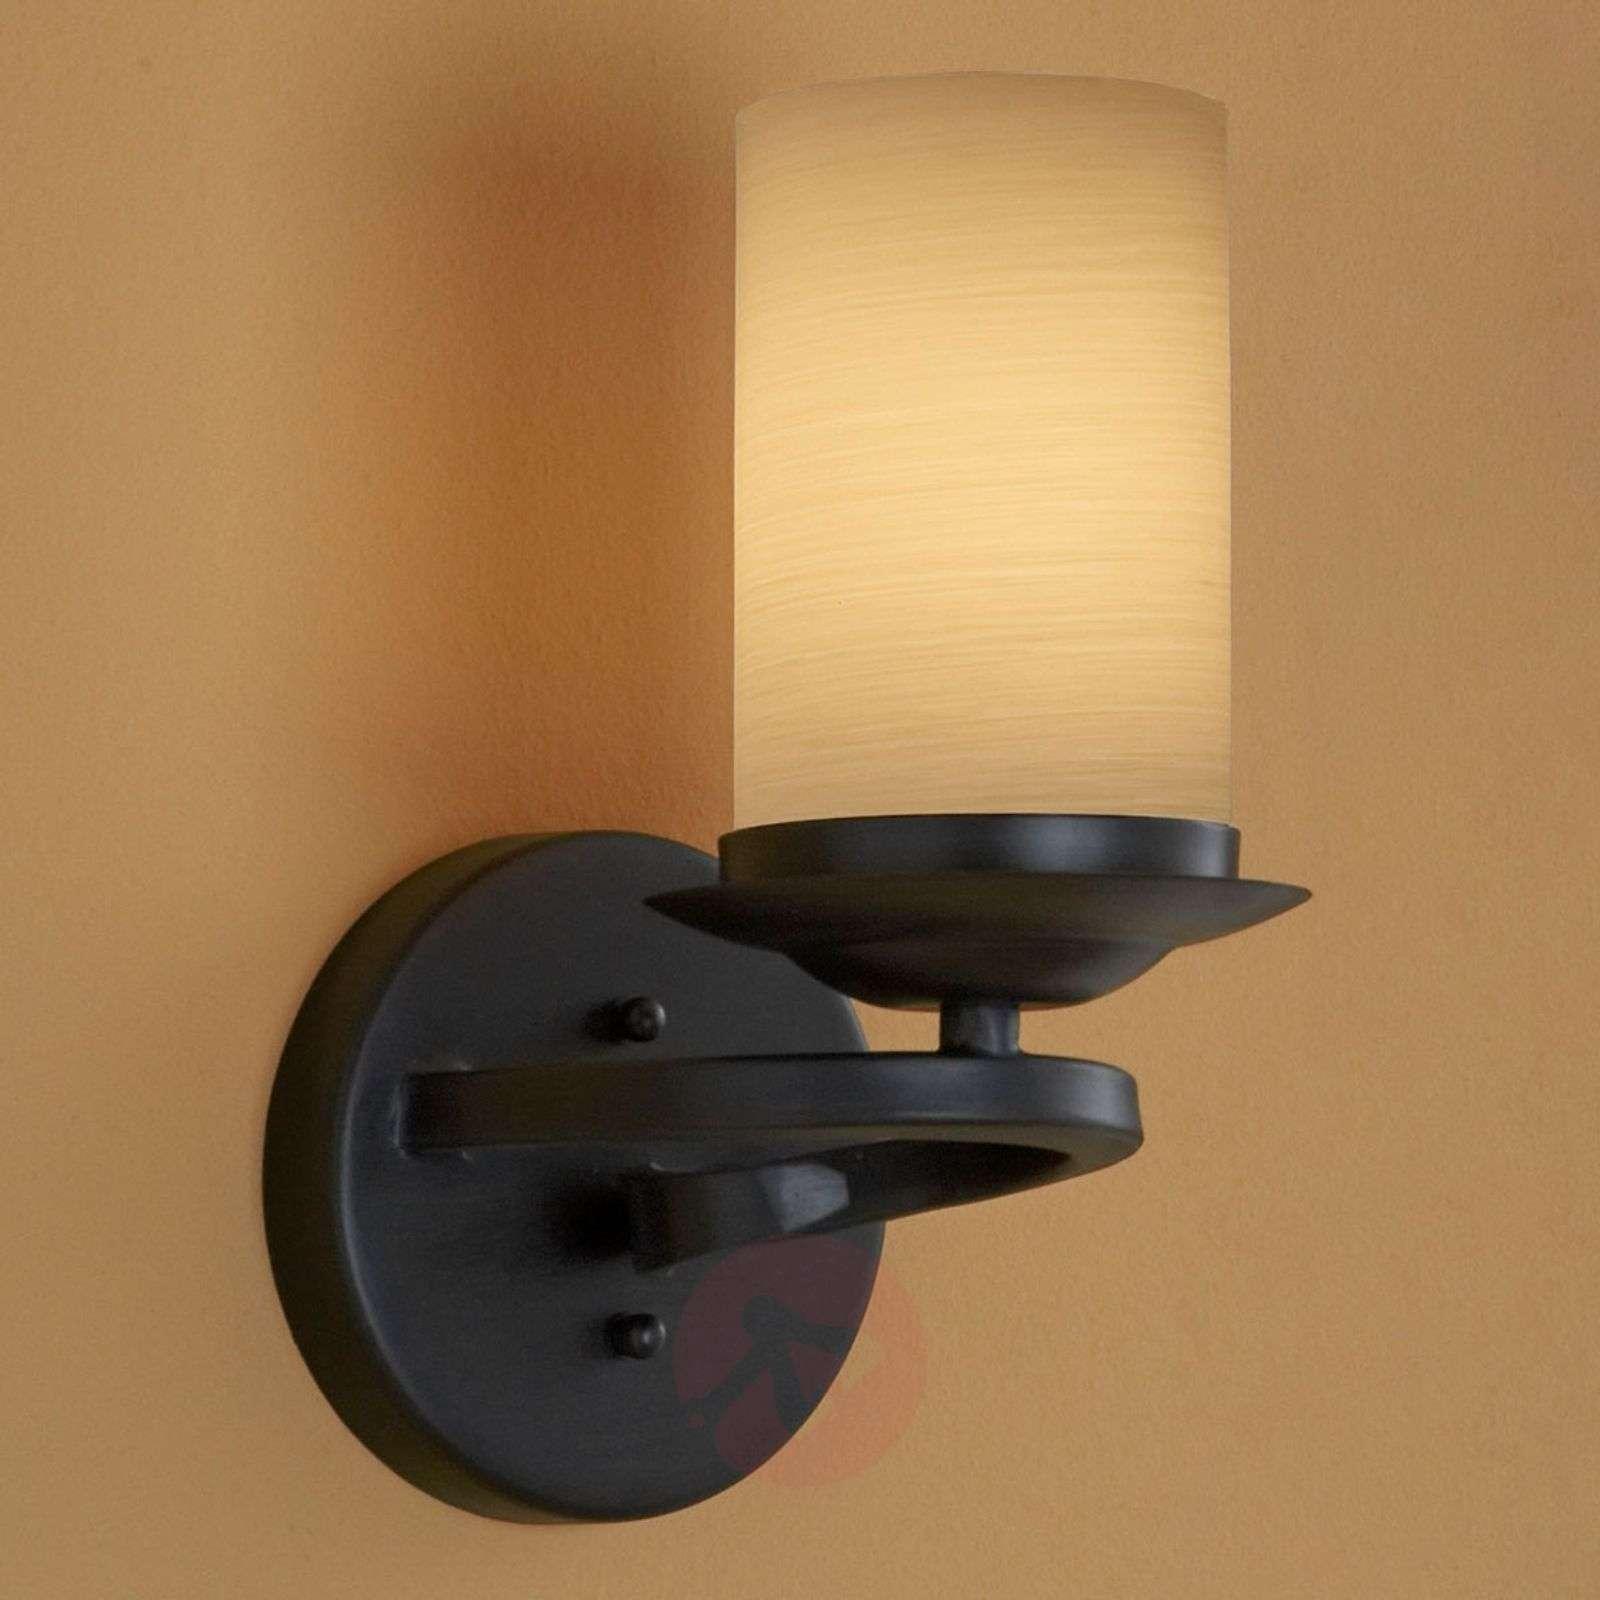 Rustic wall light CRISOL-8582045-02